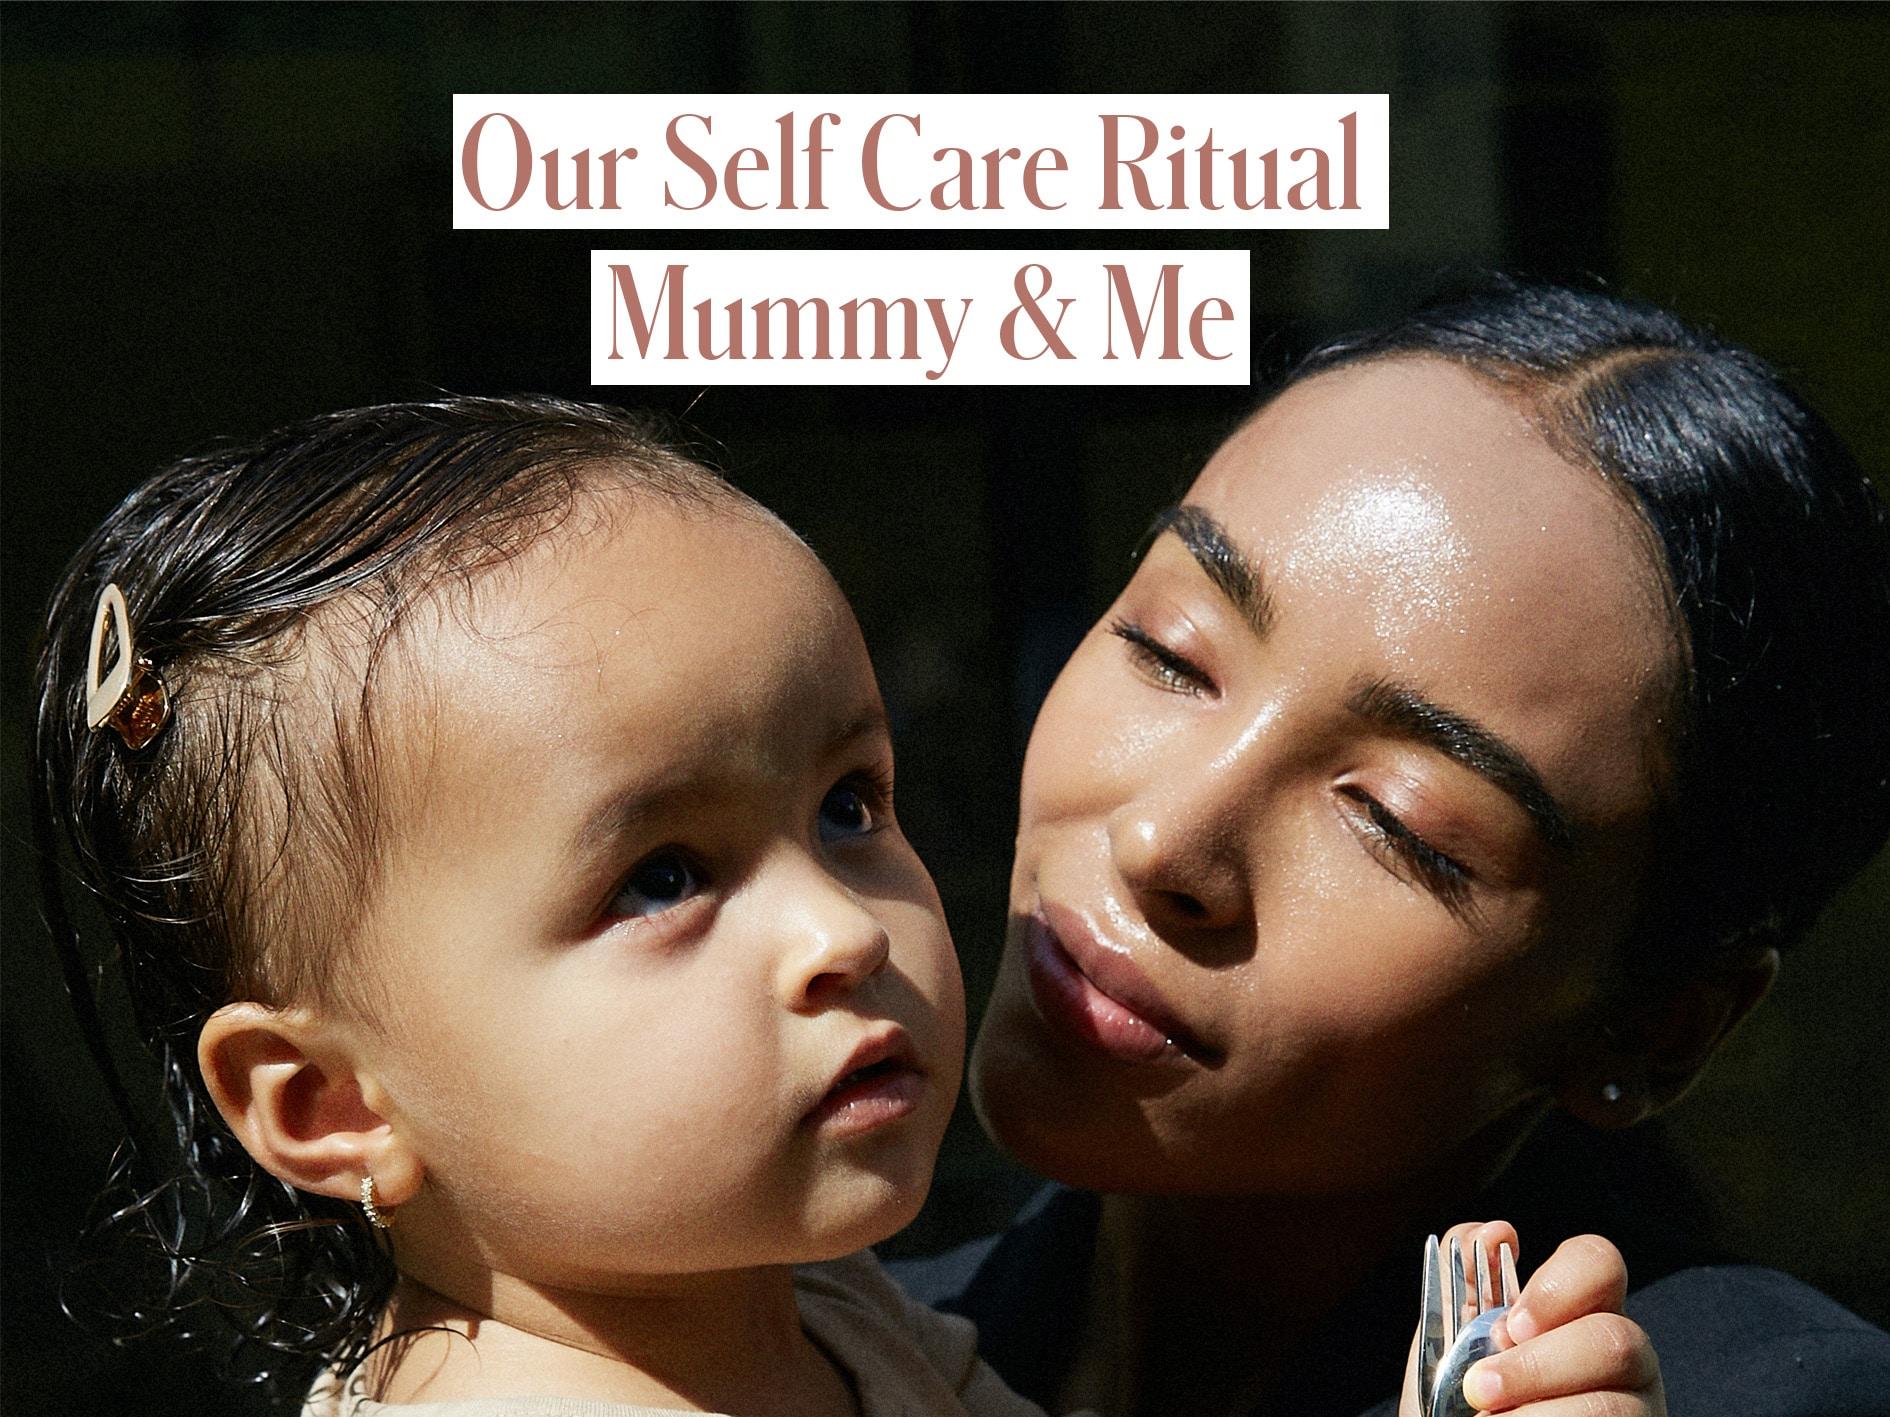 Mummy & Me Mandy Madden Kelley